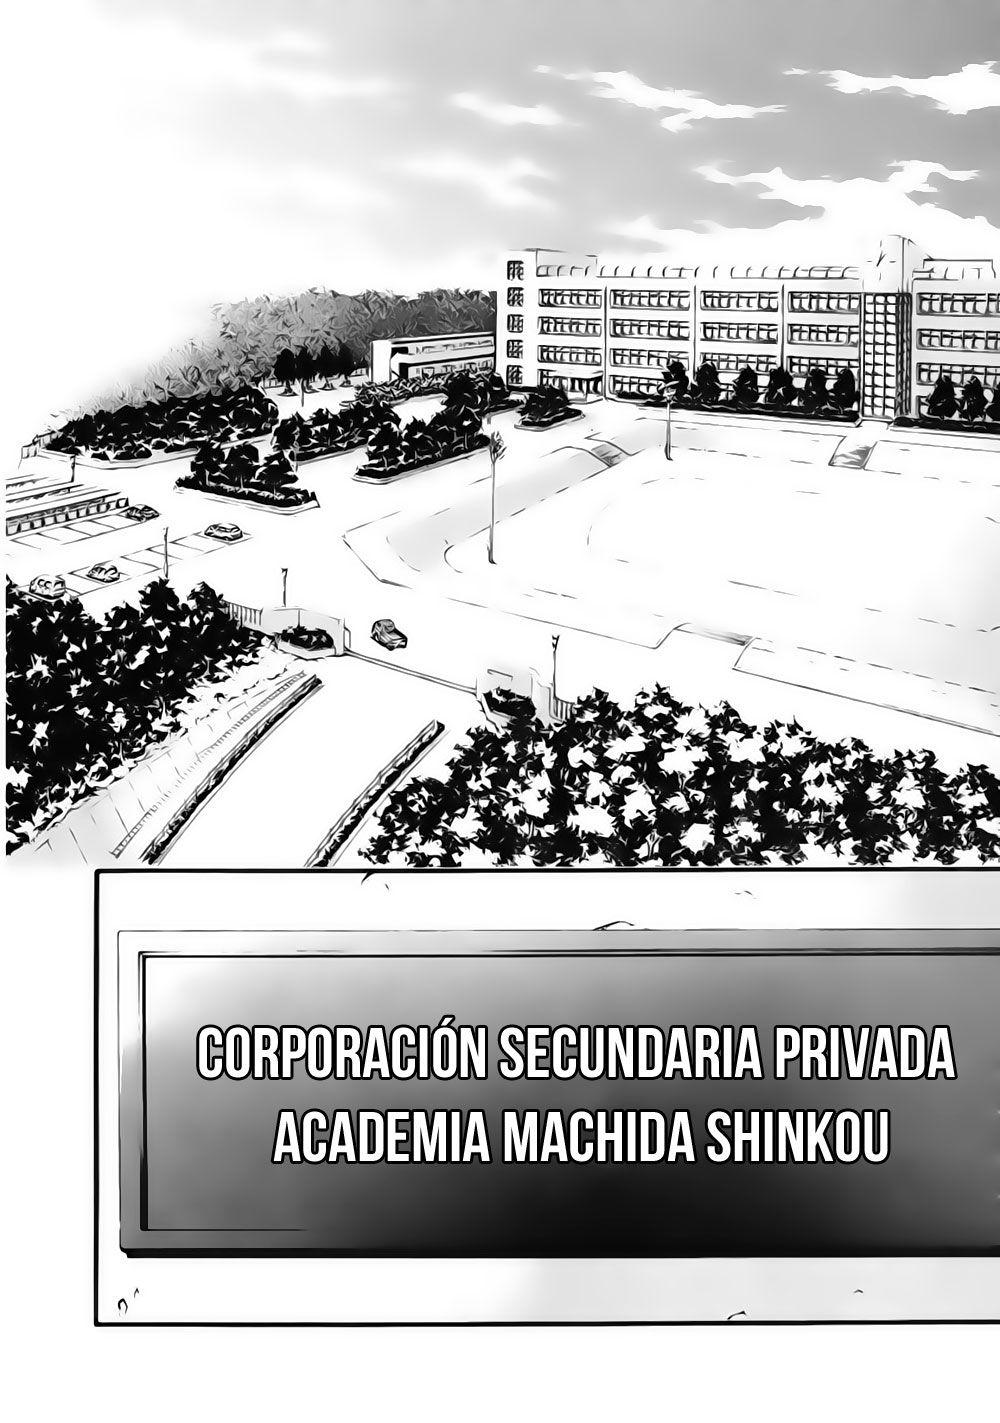 http://c5.ninemanga.com/es_manga/3/19523/460596/adf751172d9f3d7ddcf7e526d09e3fb6.jpg Page 10